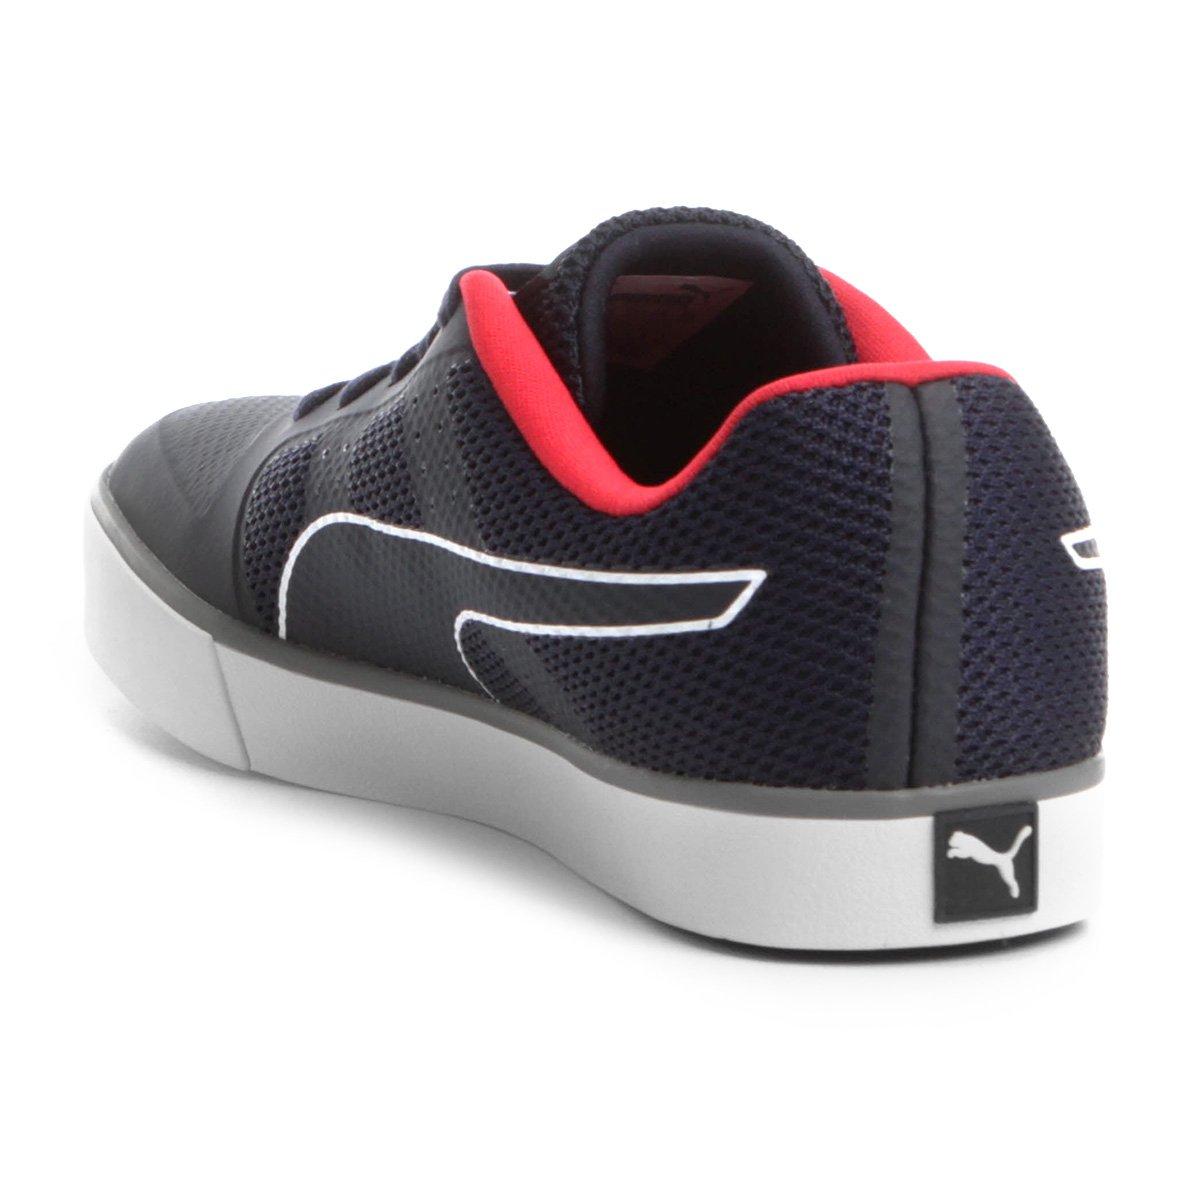 Tênis Puma Red Bull Racing Wings Masculino - Compre Agora  e5ca5999d590e